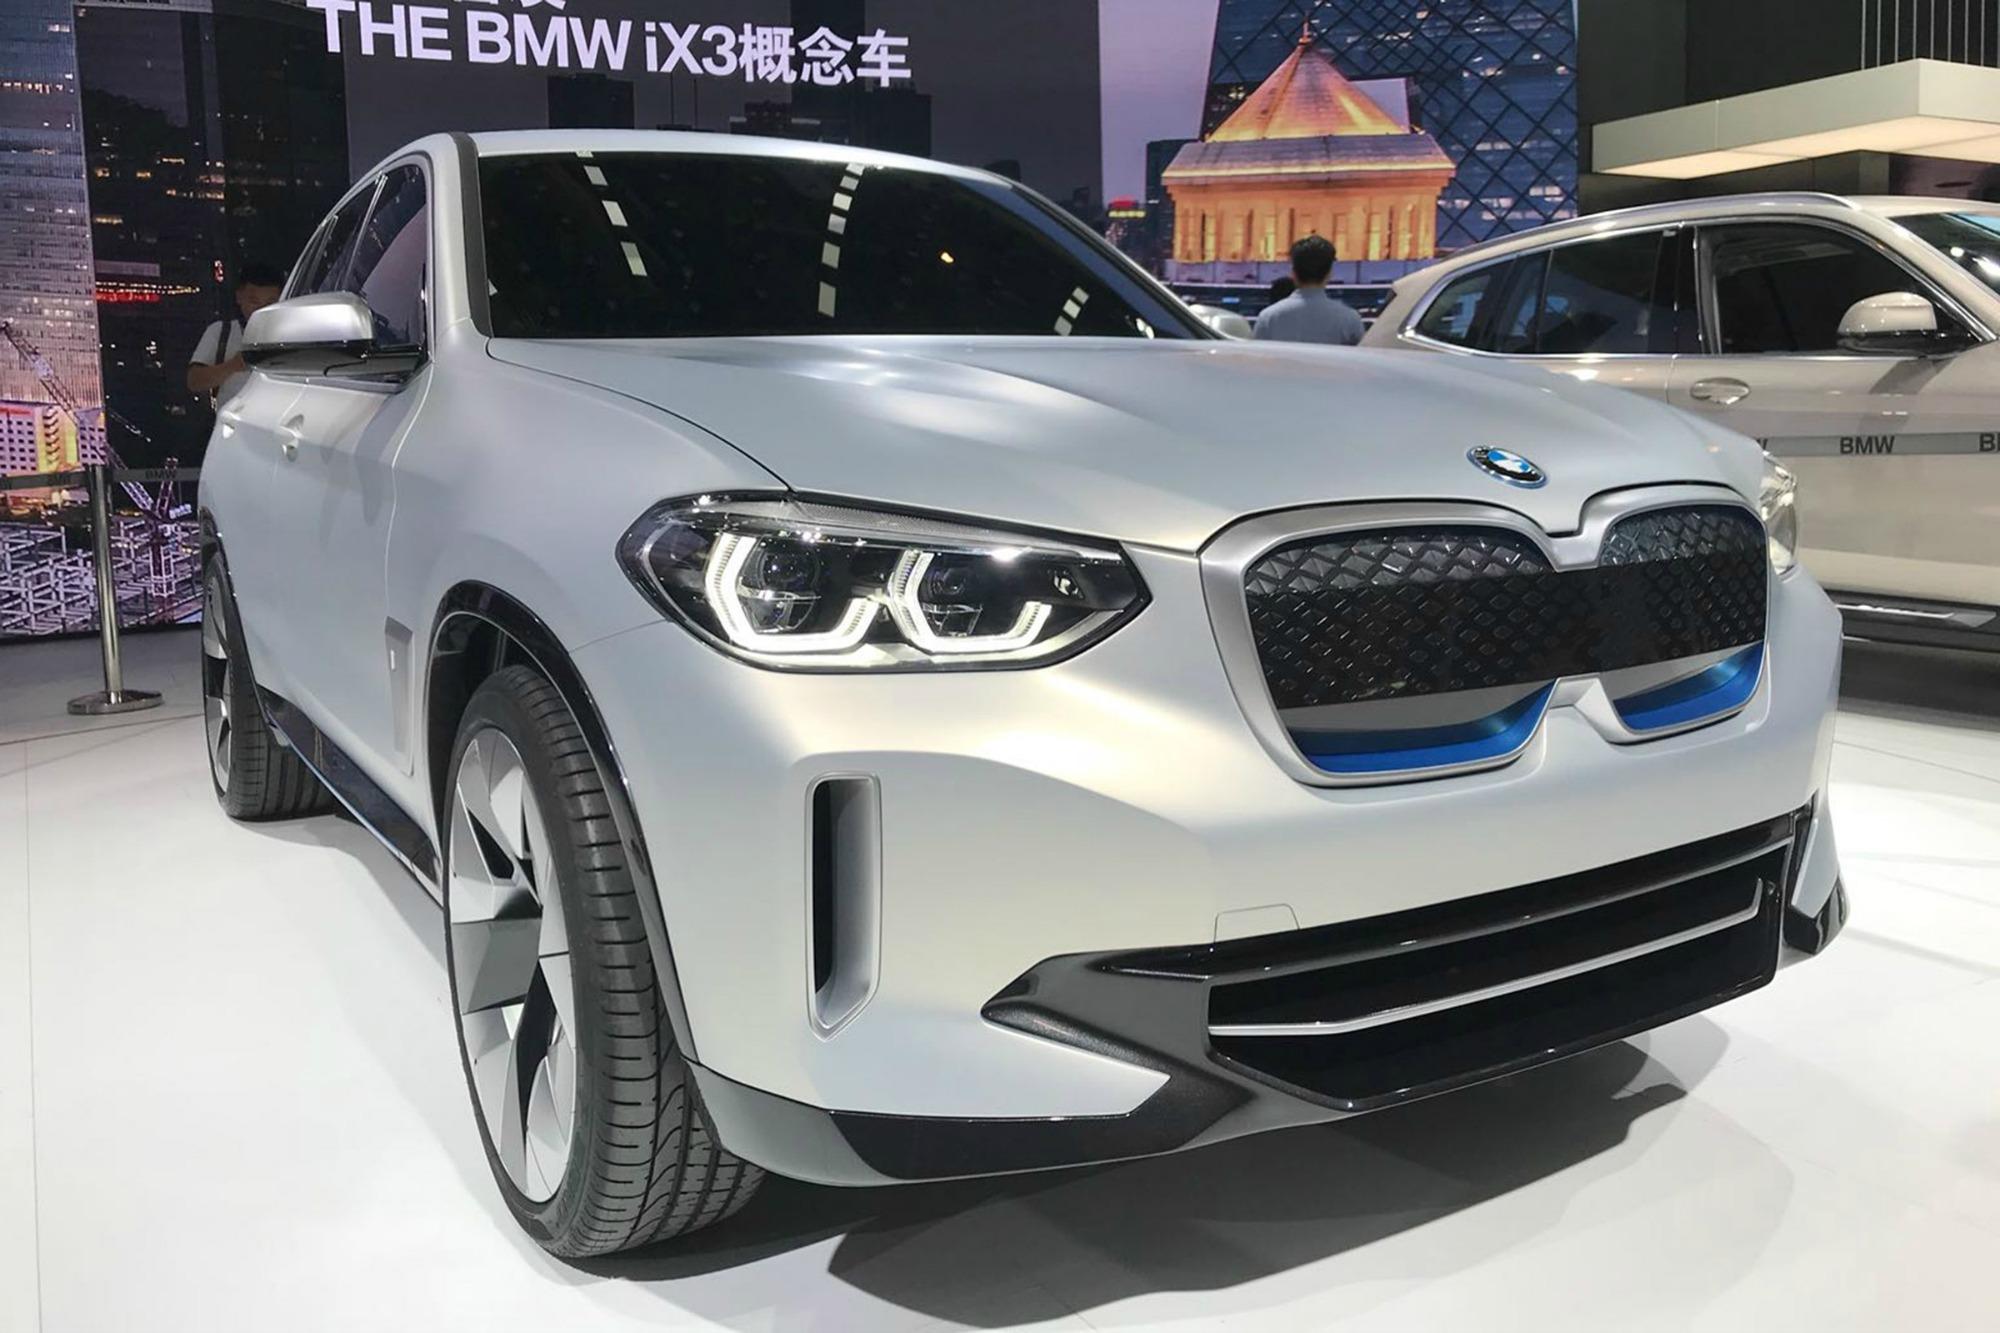 Concept BMW ix3